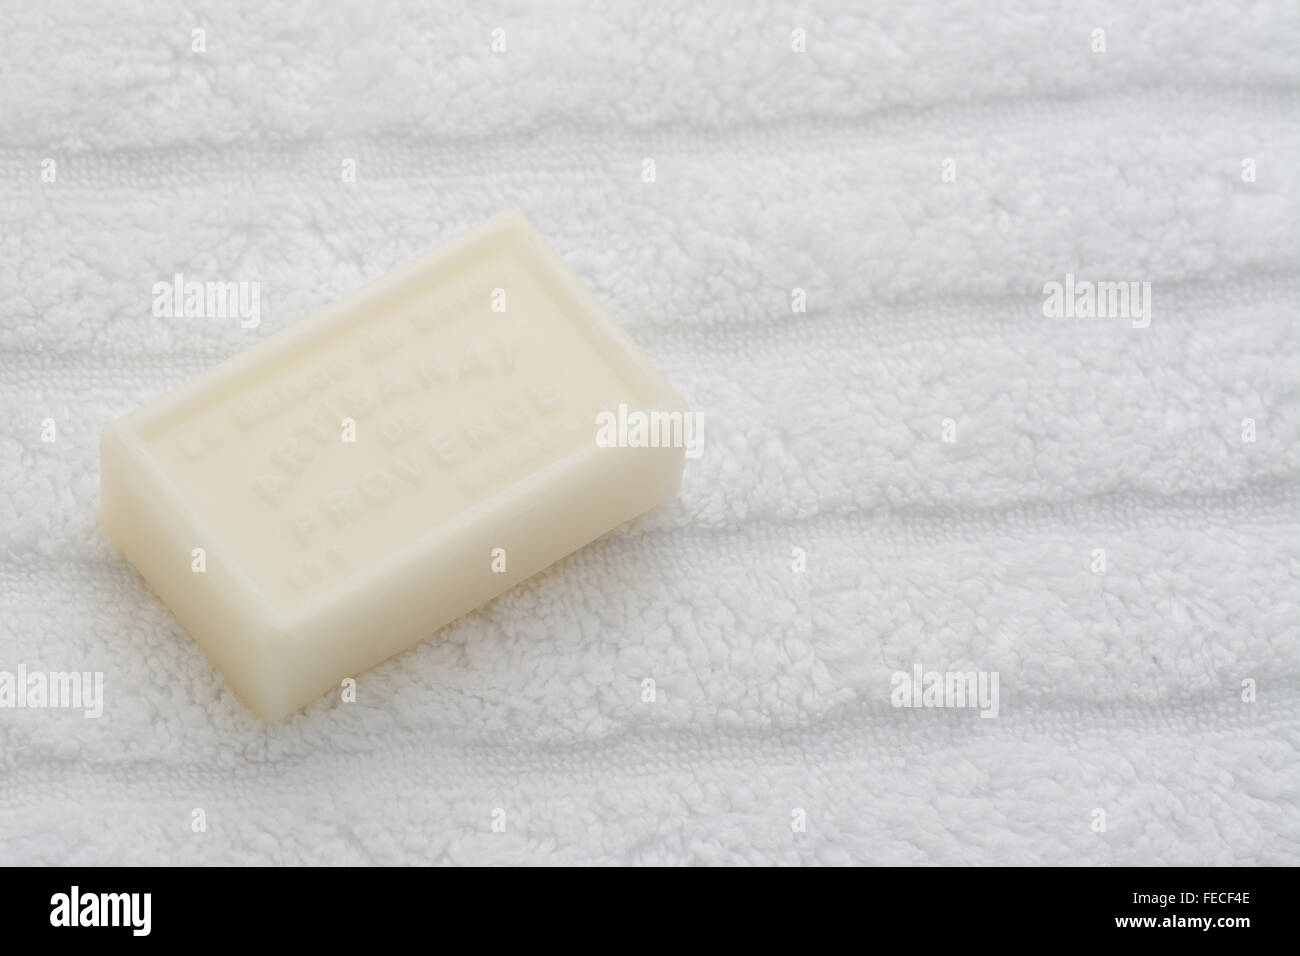 La Maison du Savon French scented soap - Stock Image